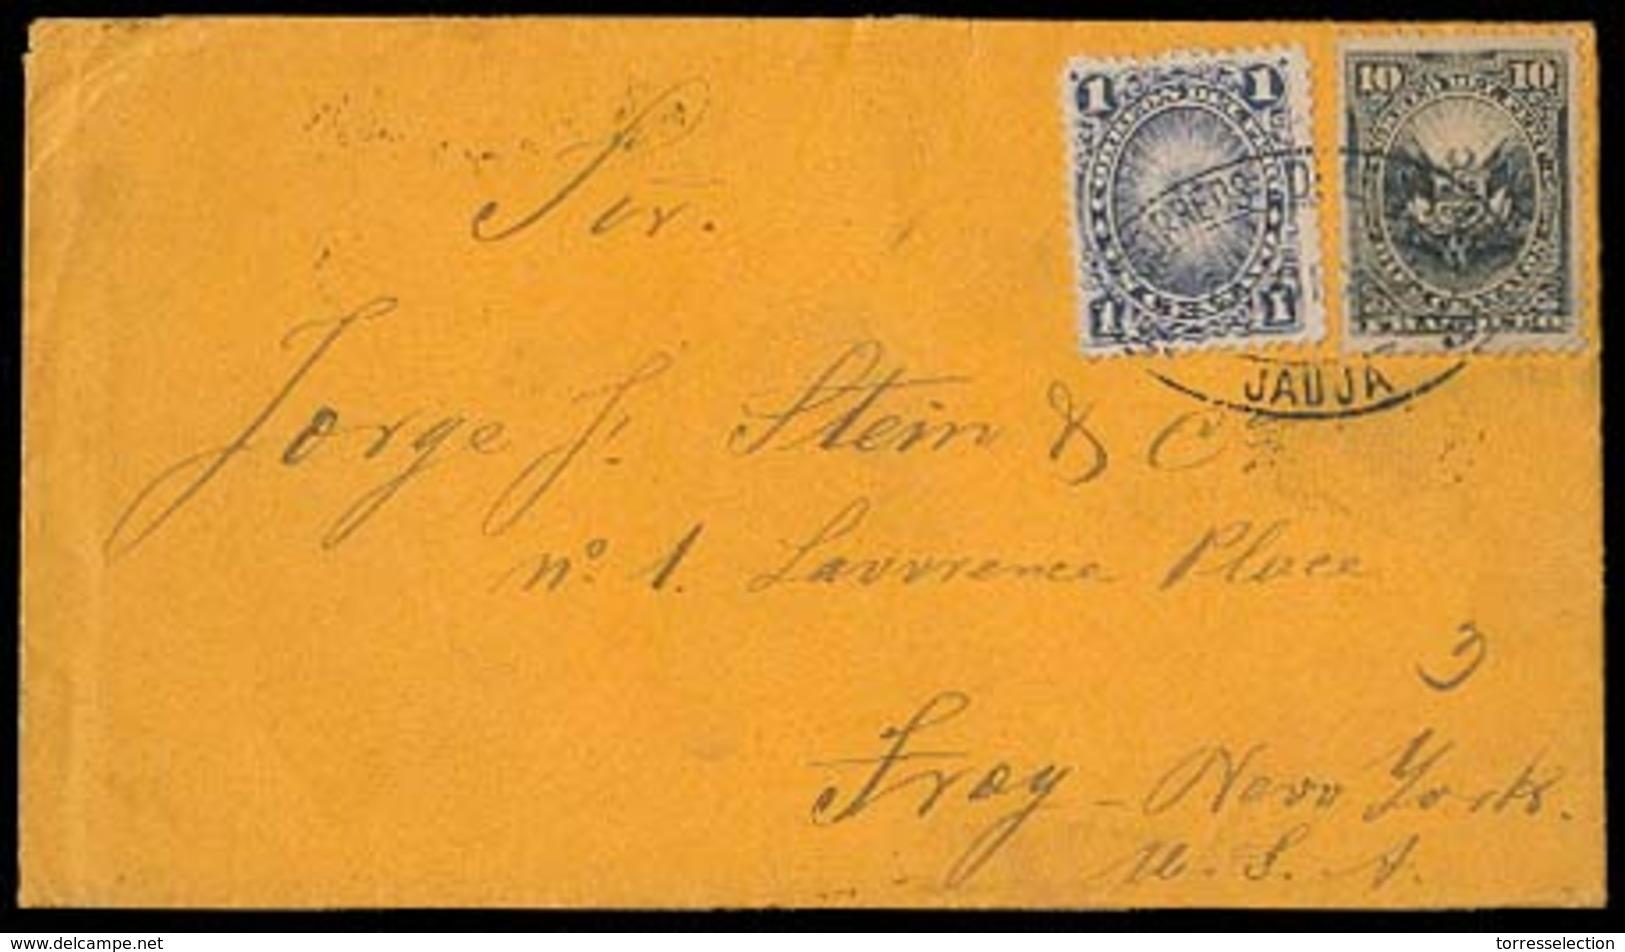 PERU. 1891. Sanja - USA. Fkd Env Oval Ds. VF. - Peru